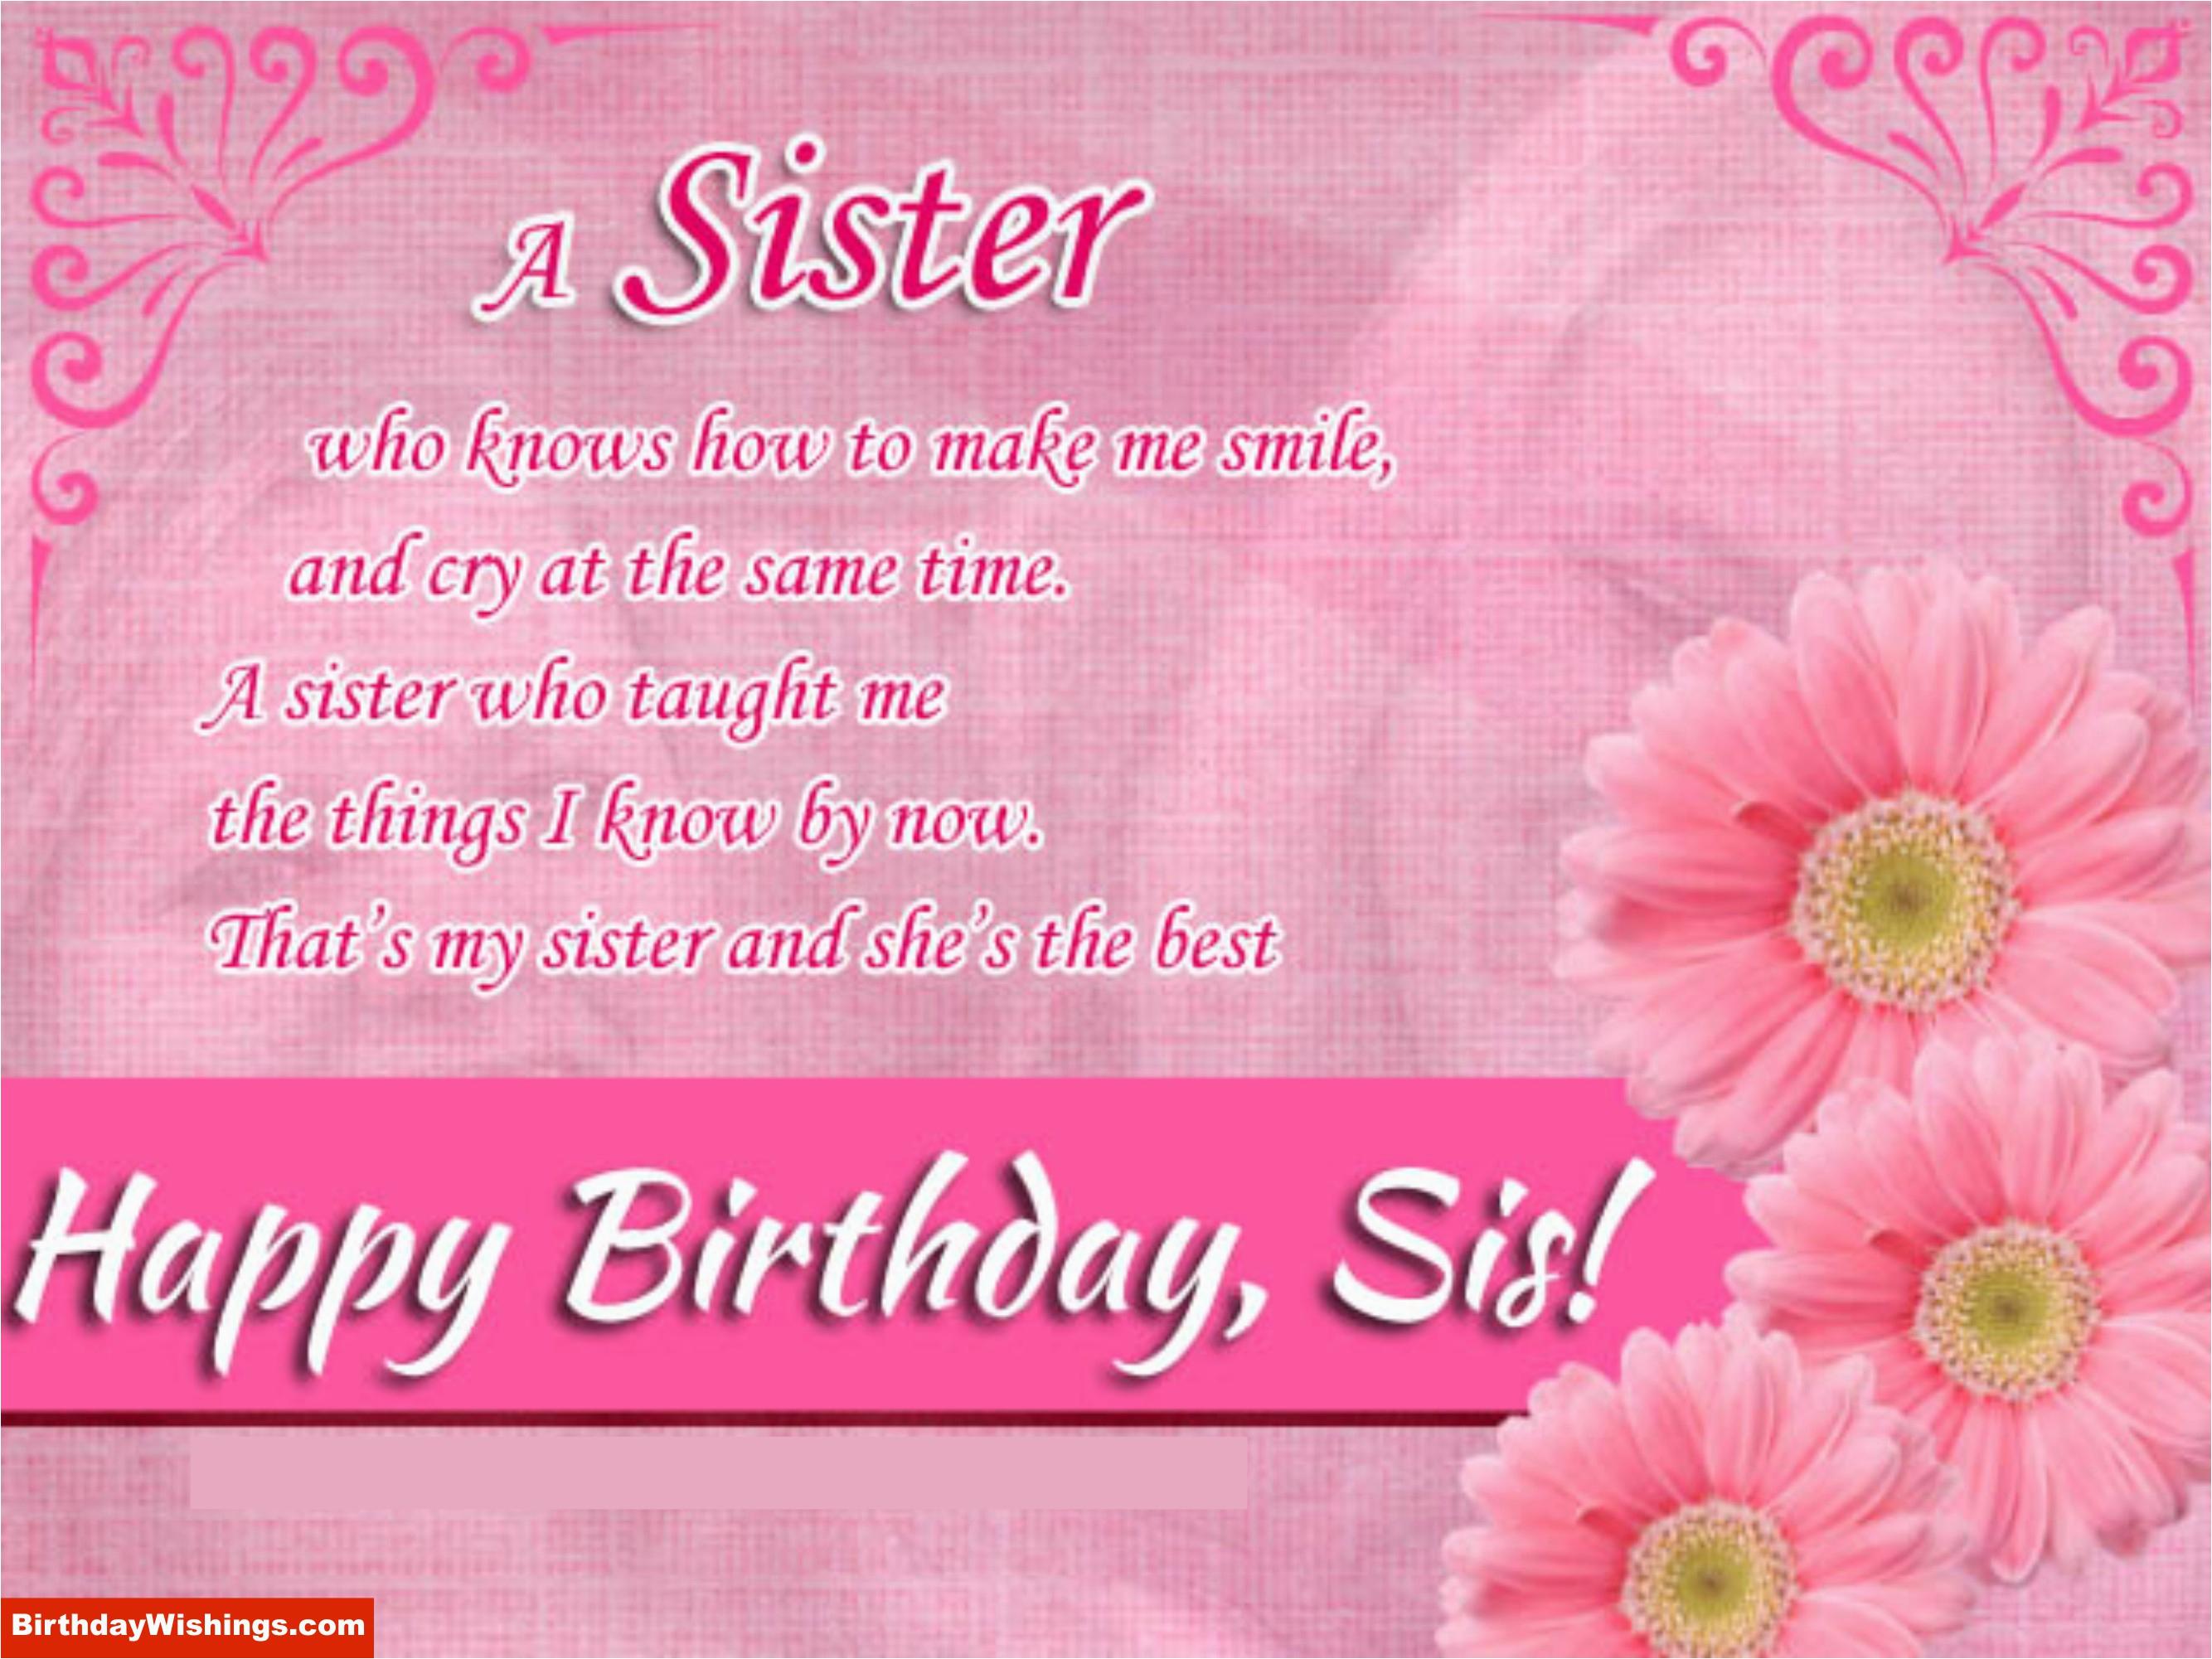 wish happy birthday sister